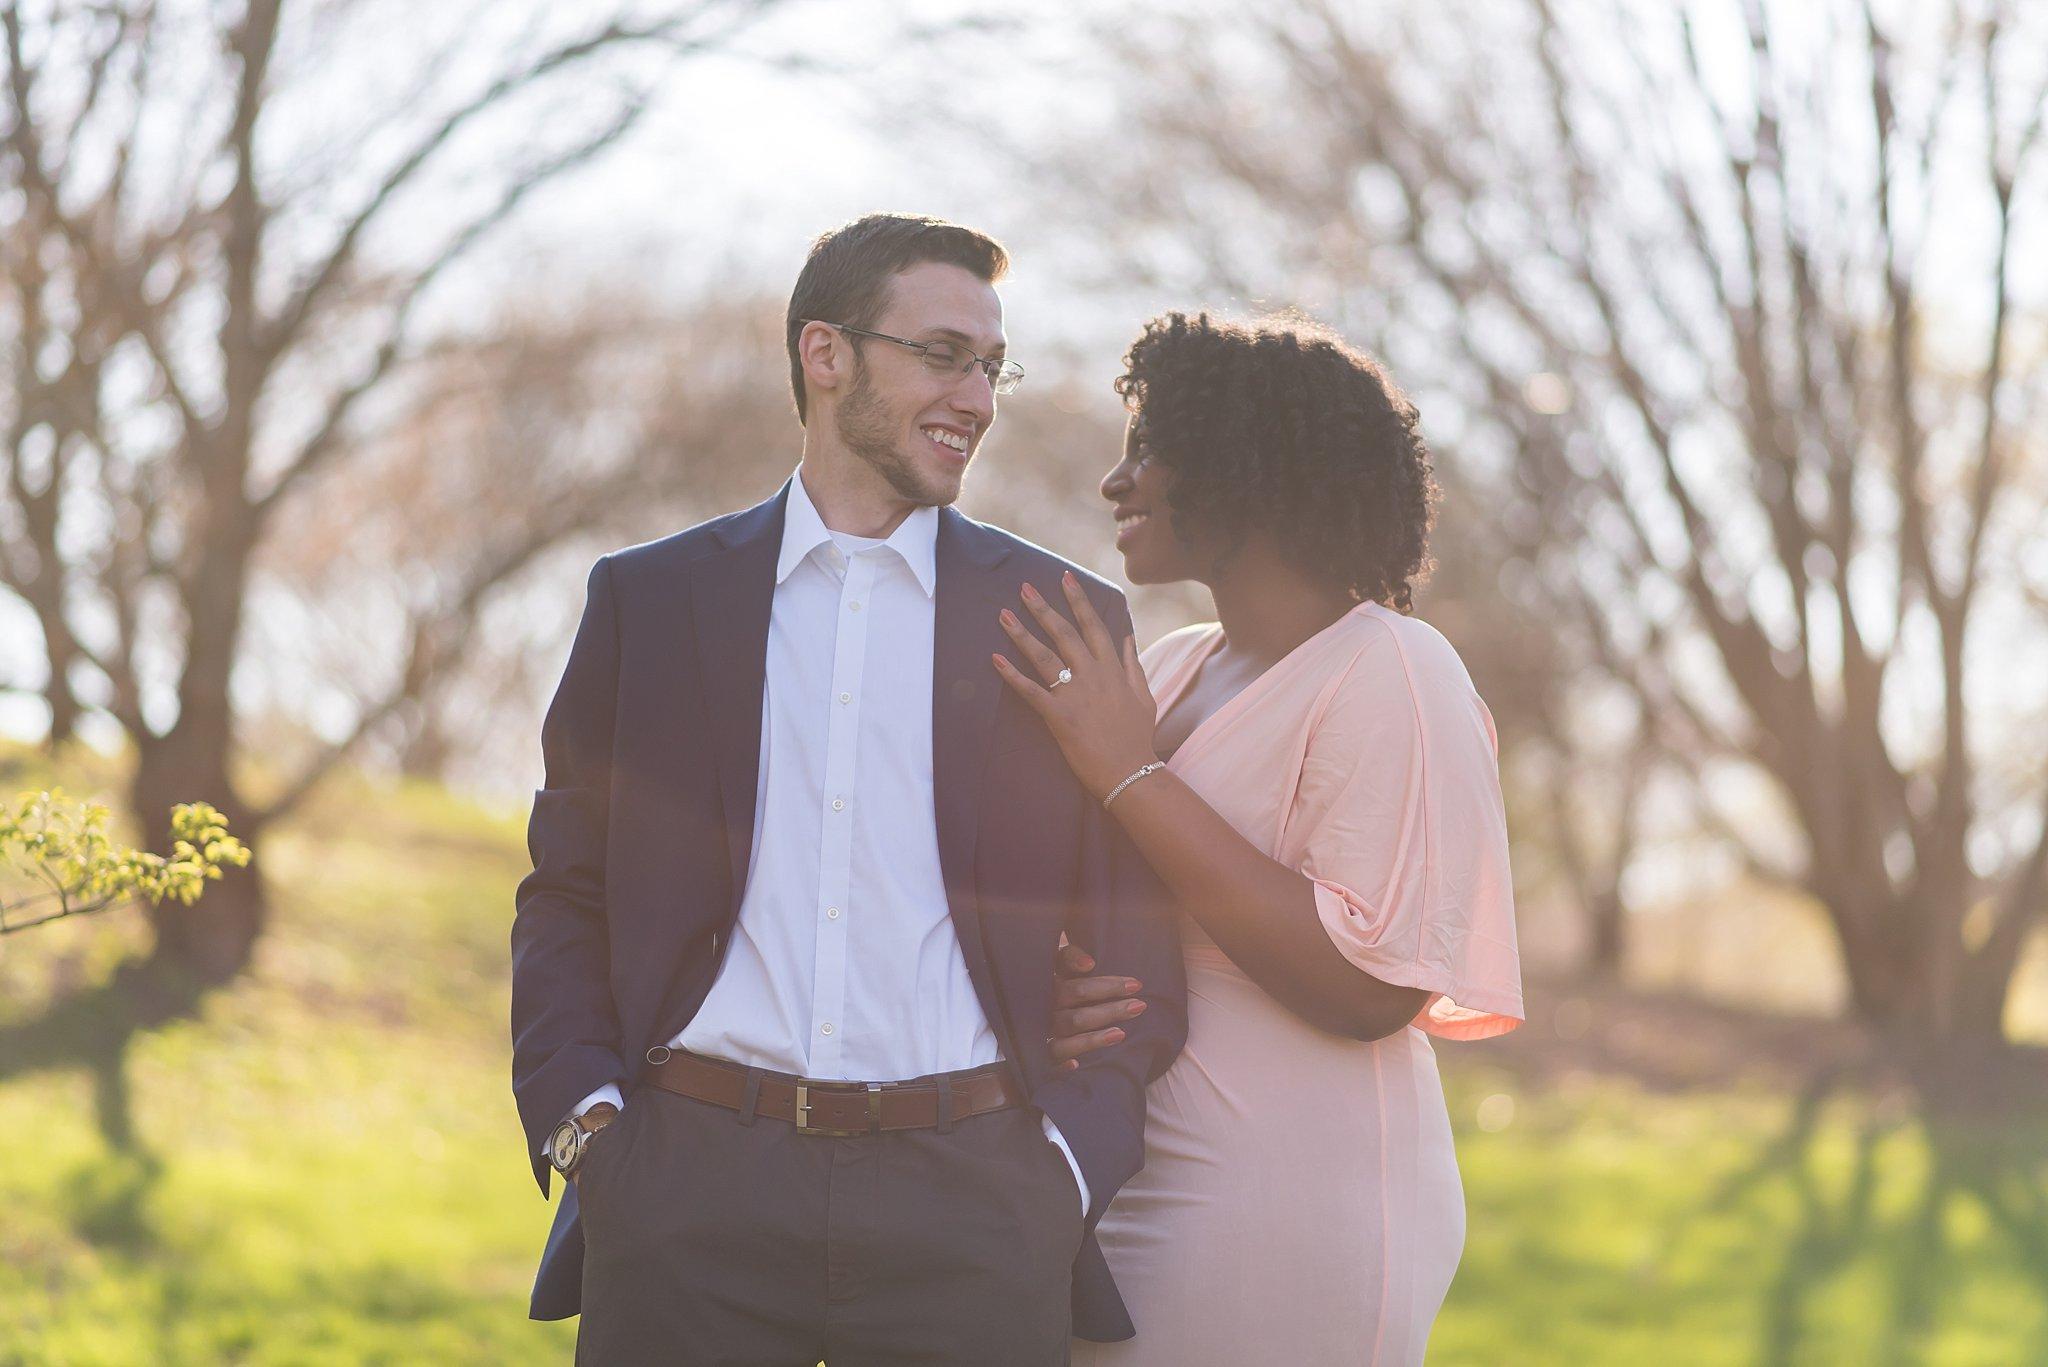 Surprise proposal photographer in Boston 9.jpg